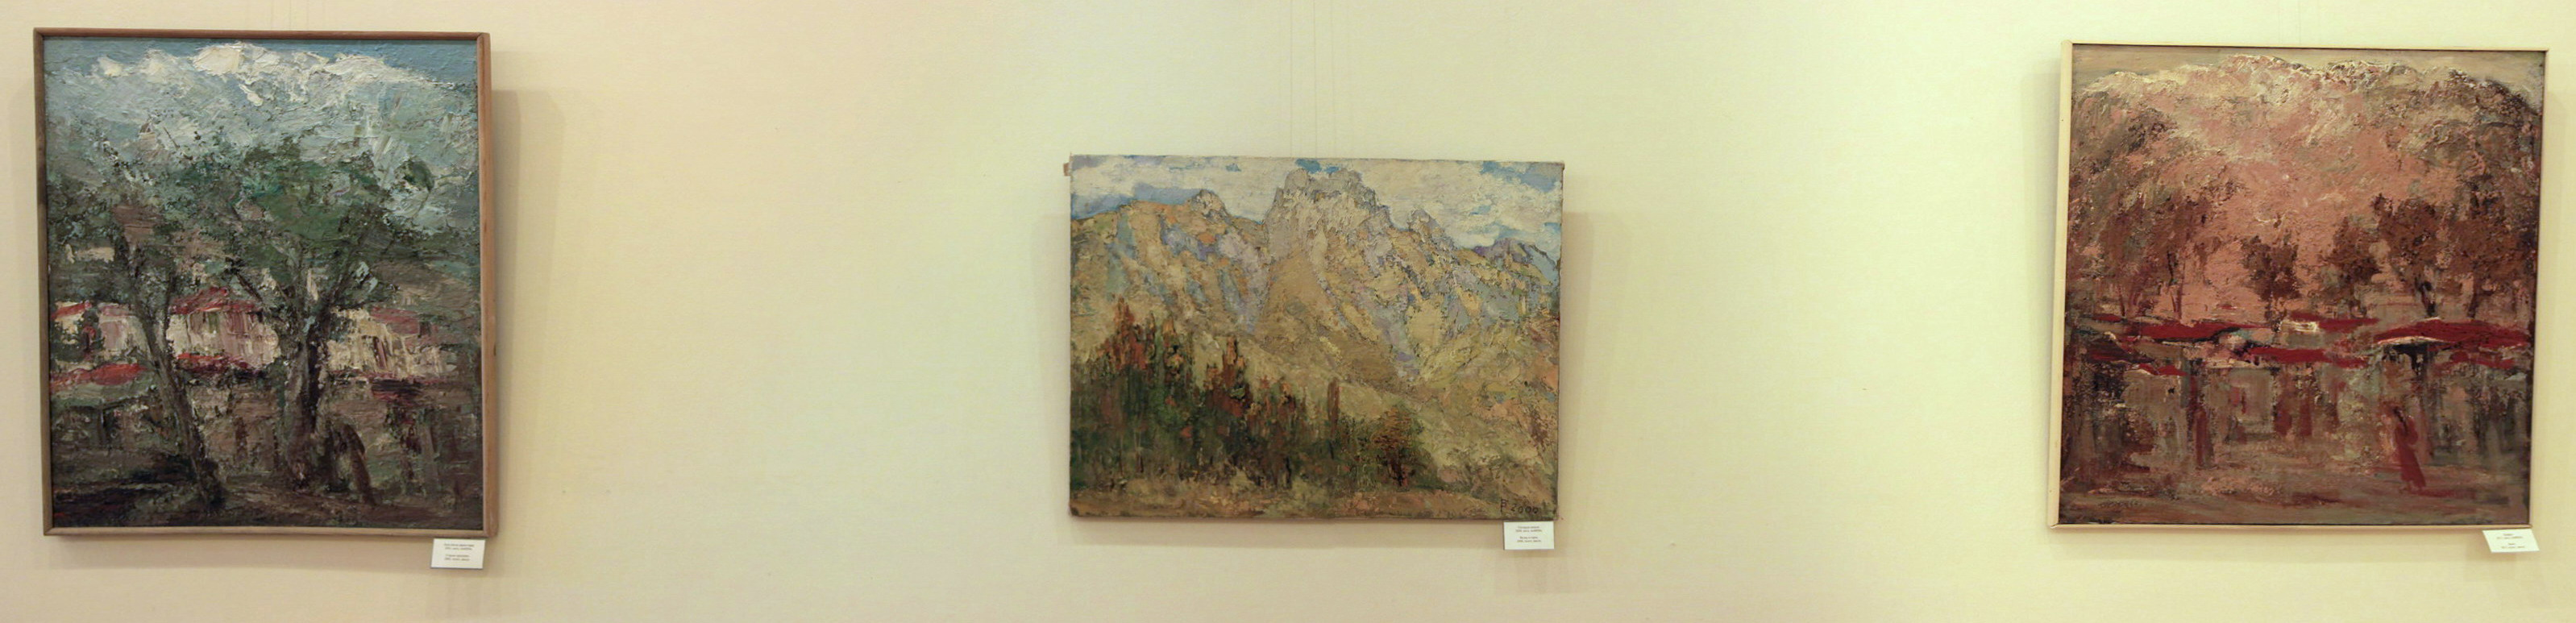 Гаглоева Римма. Экспозиция картин (3)